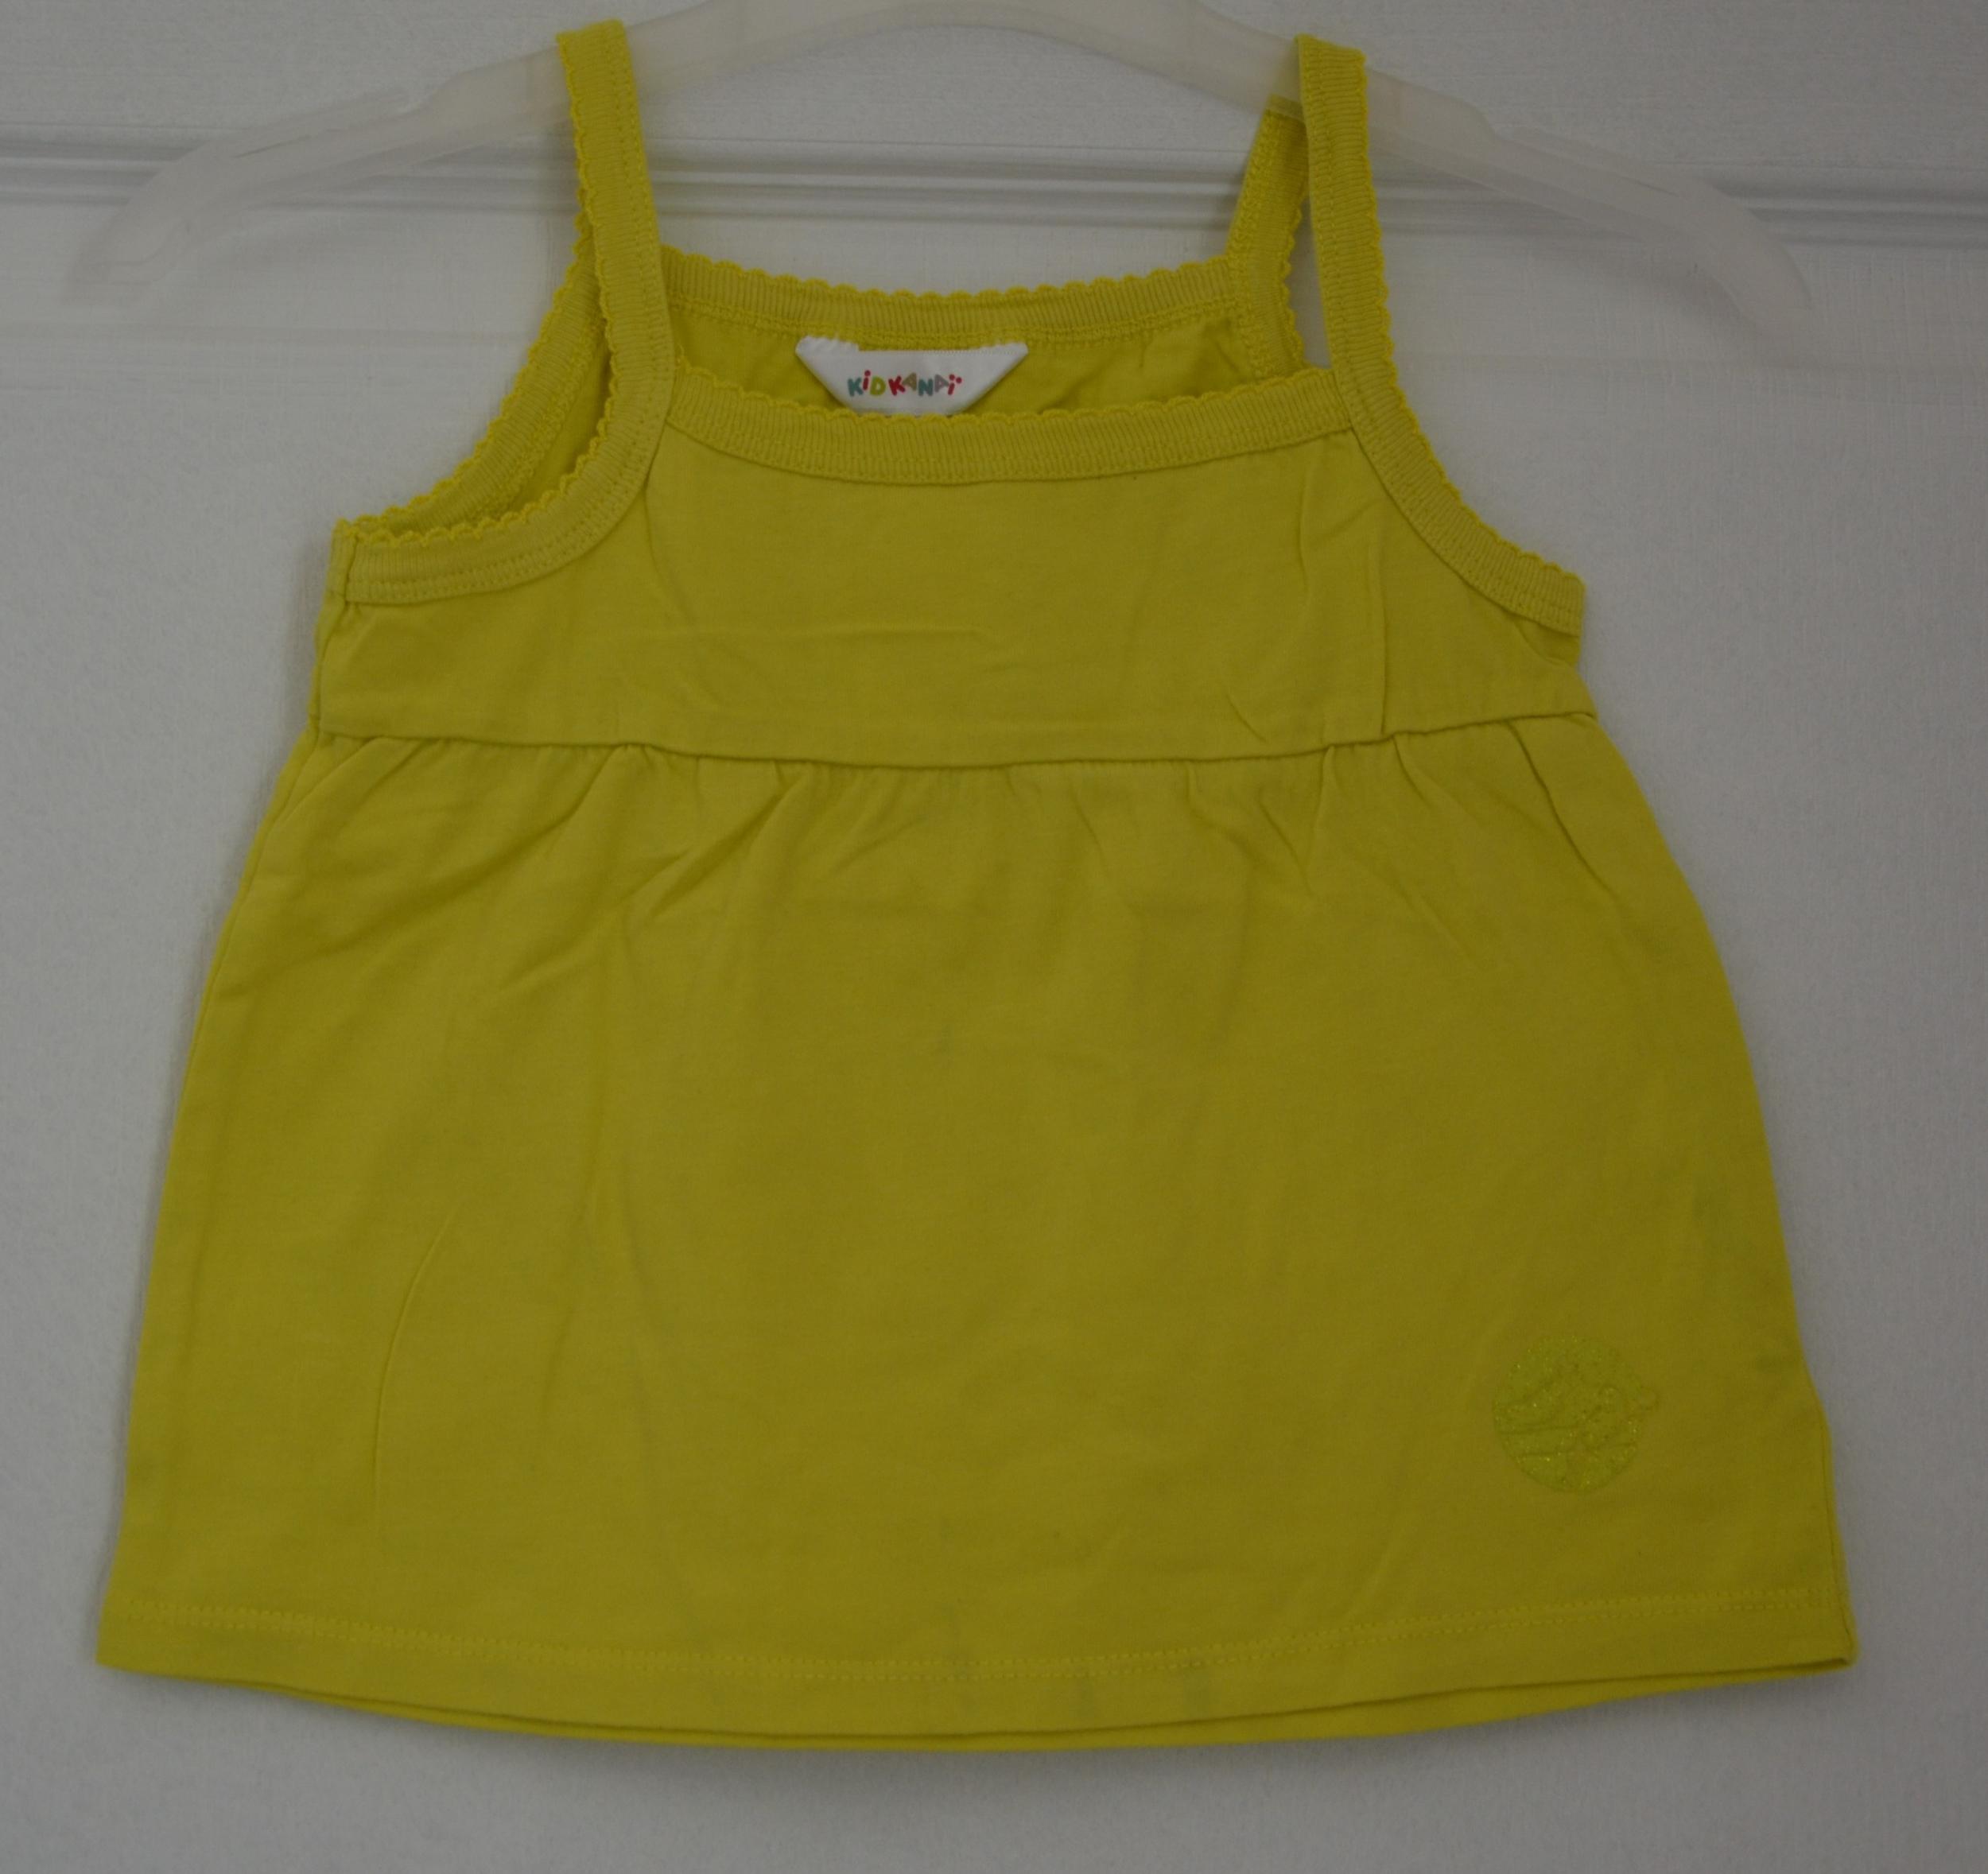 débardeur jaune fille 24 mois kidkanaï vetement bebe occasion